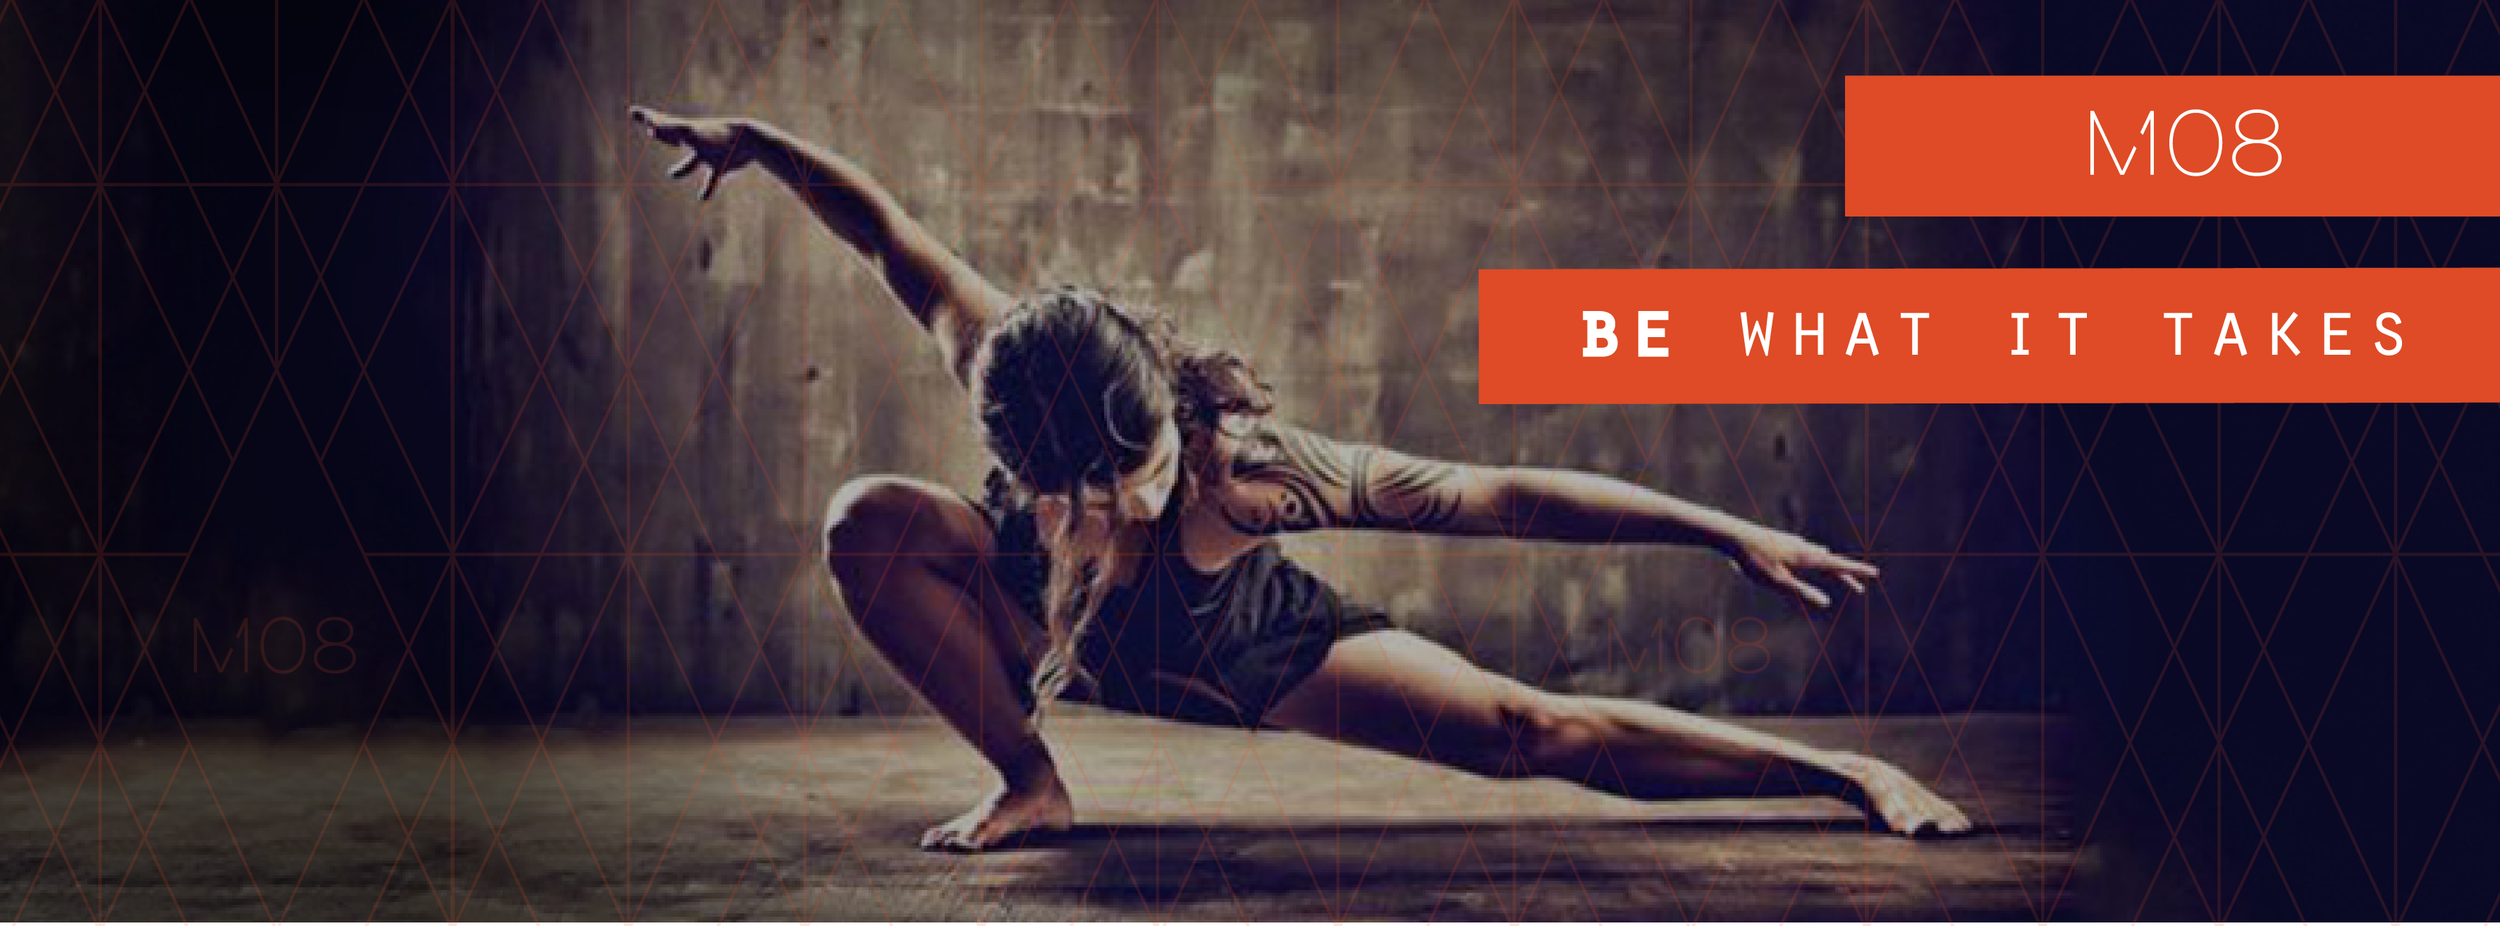 motivation-fitness-quote-design